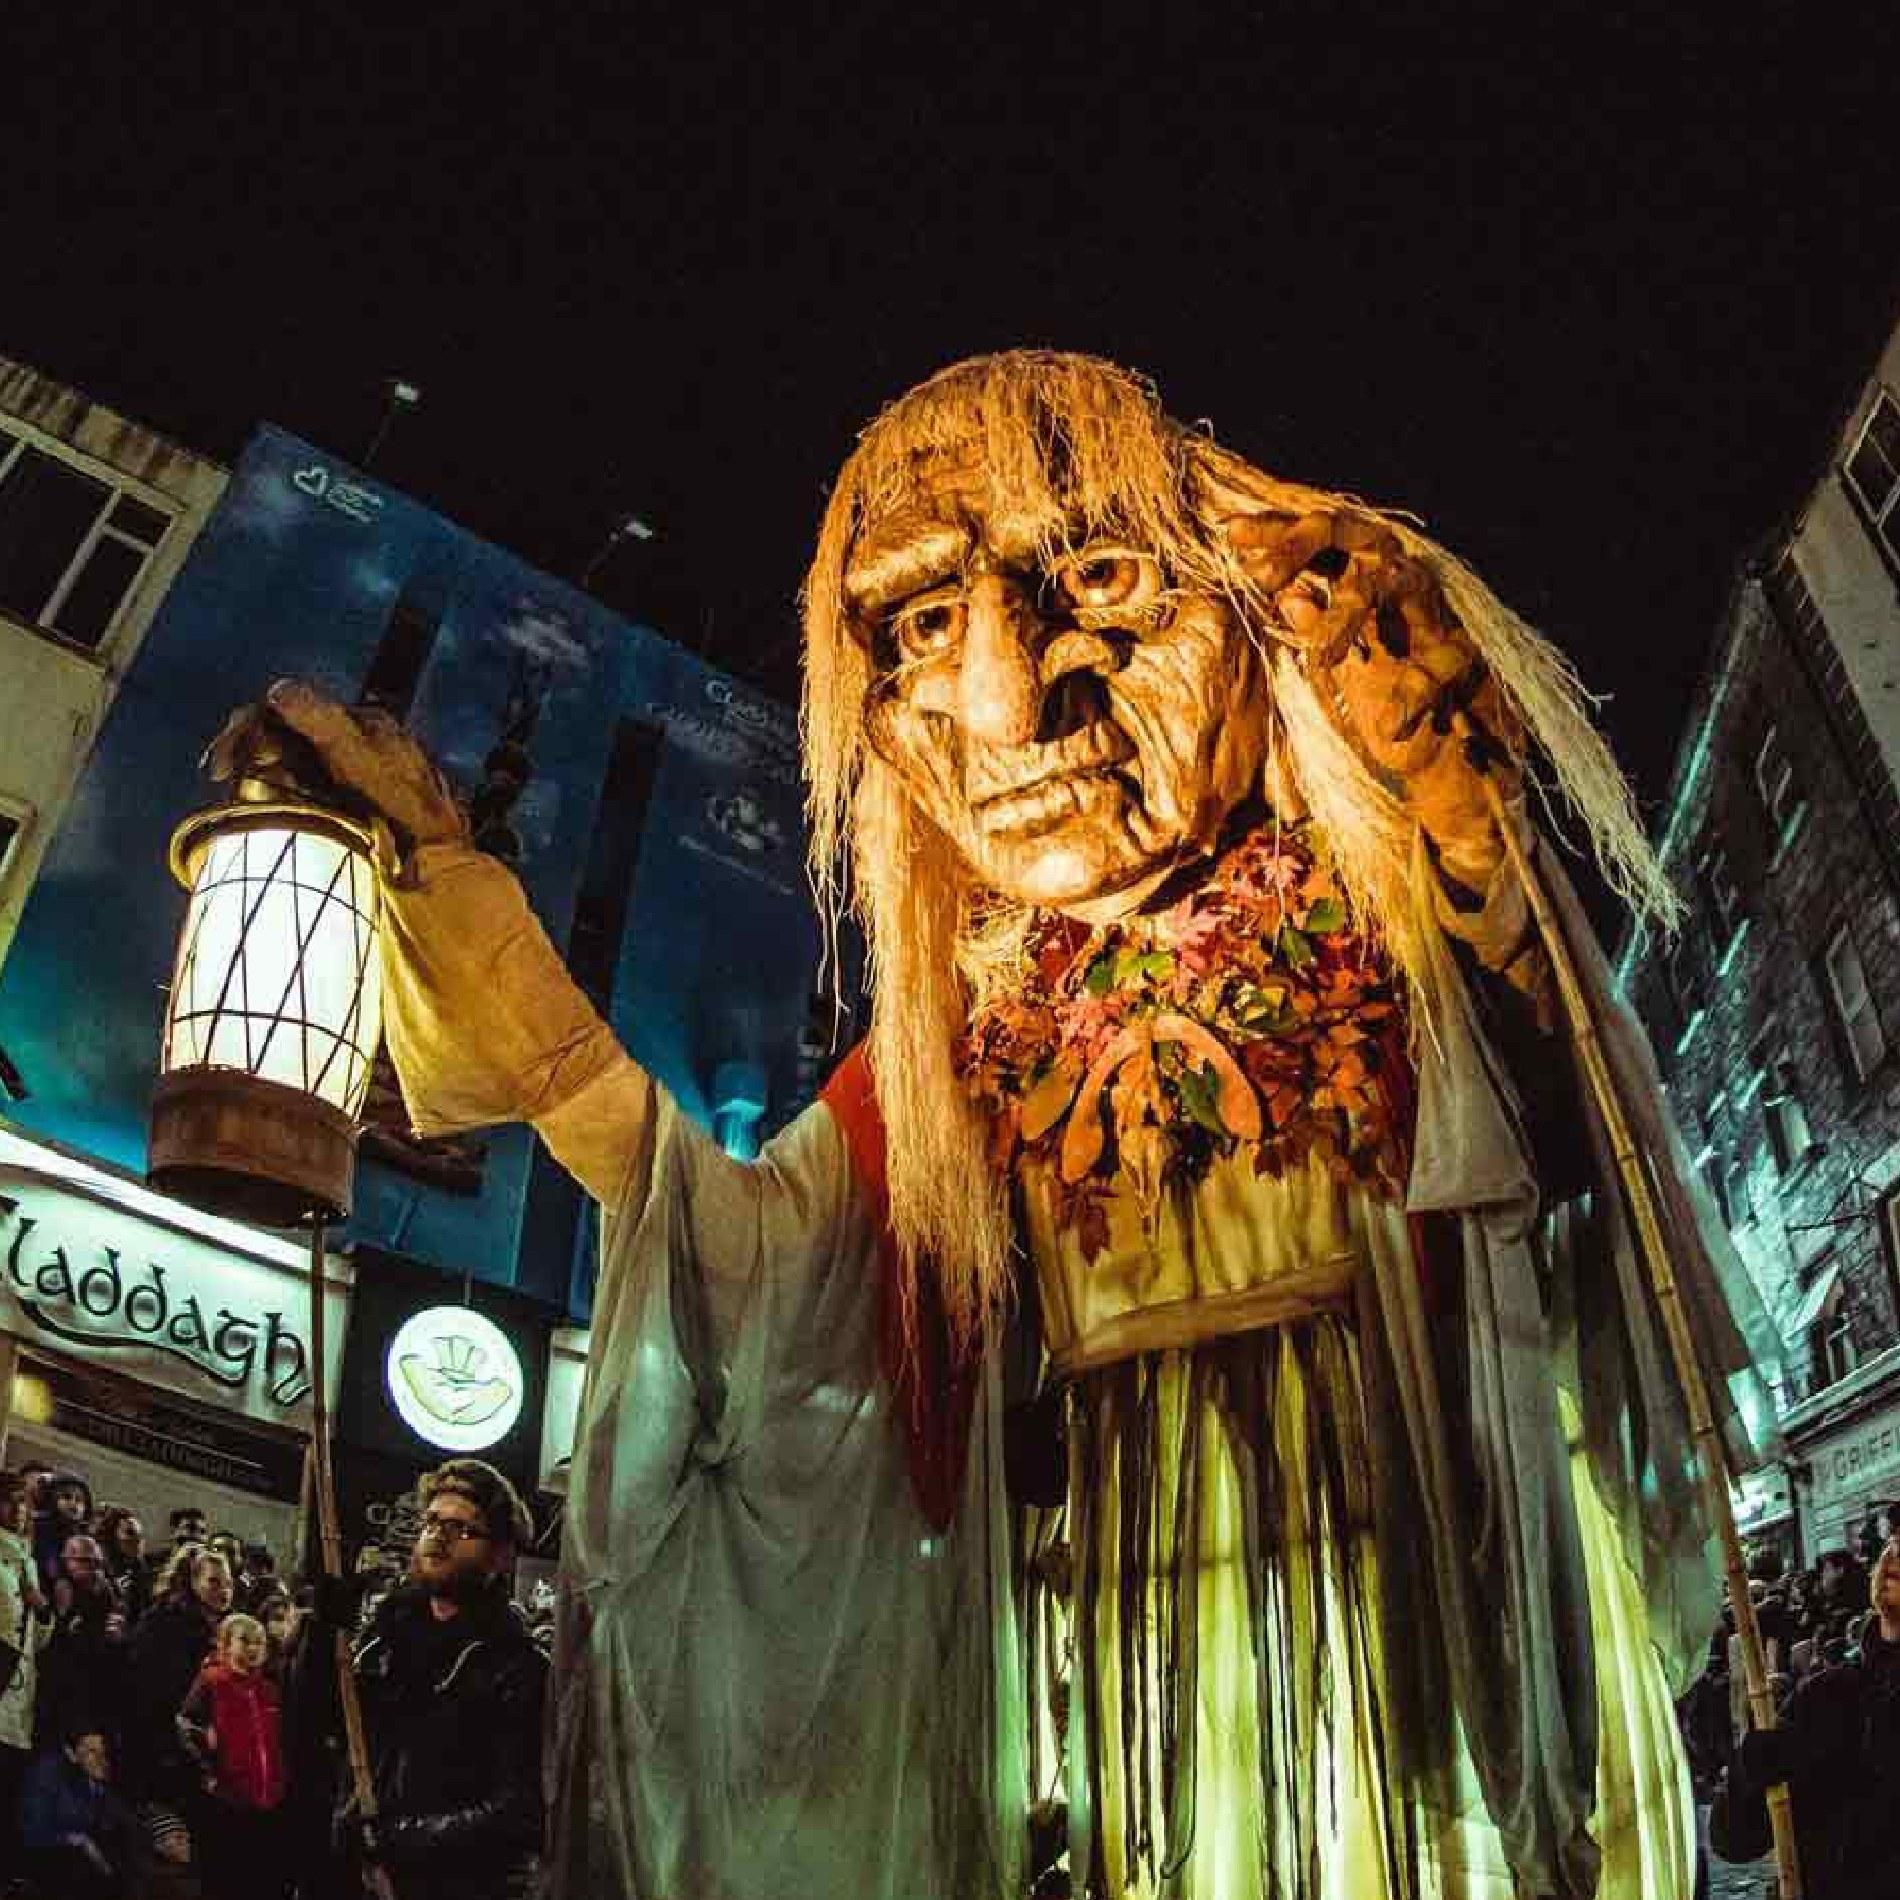 50 Reasons We Love Galway | Conancht Hotel celebrate 50 years